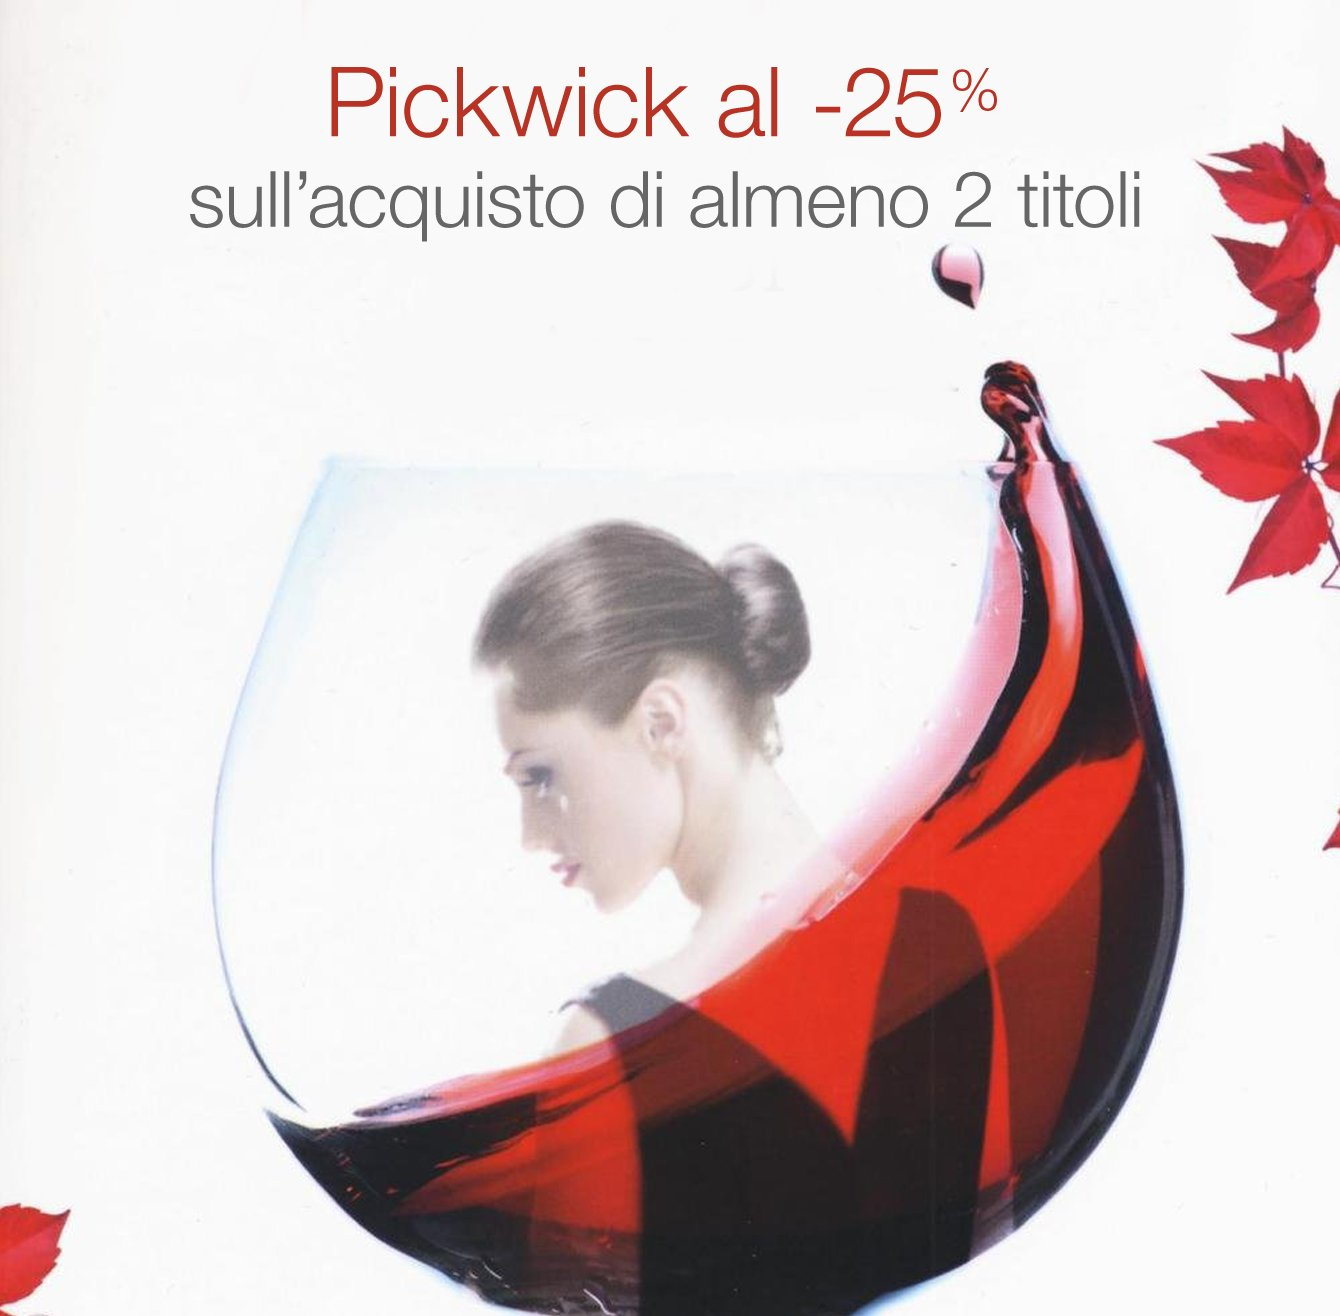 Pickwick al -25%